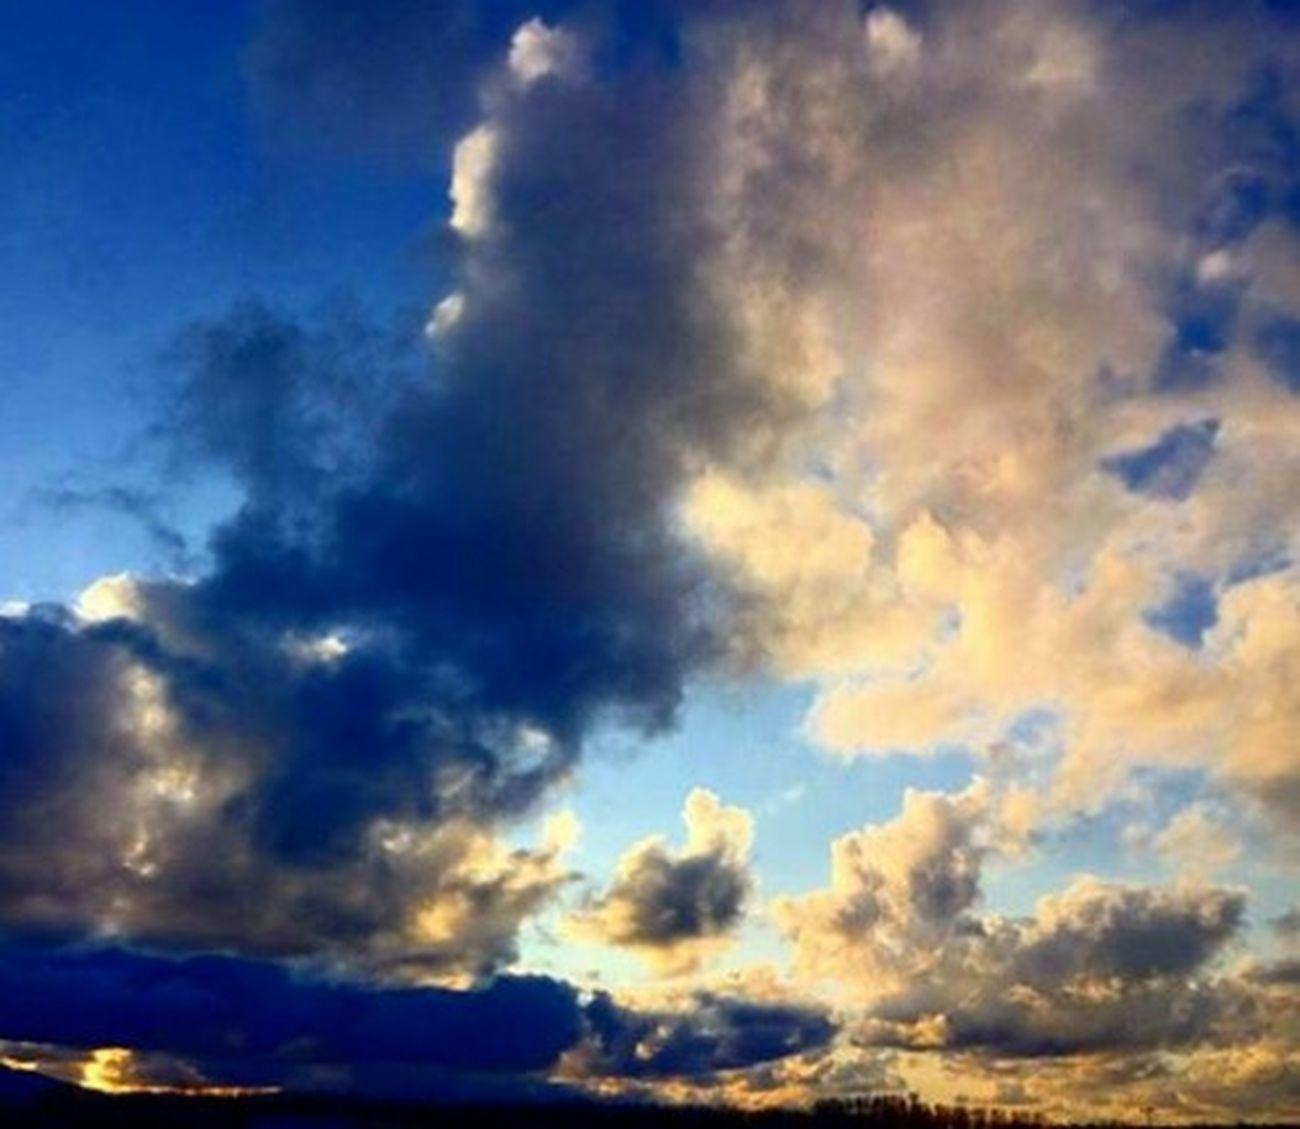 Sky Cloud - Sky Blue Dramatic Sky Nature Beauty In Nature Eye4photography  Sky_collection 3XSPUnity 空 Hello World EyeEm Best Shots EyeEm Nature Lover EyeEm Best Shots - Nature Taking Photos Nature Relaxing 雲 Day Love It Beauty In Nature Dramatic Sky